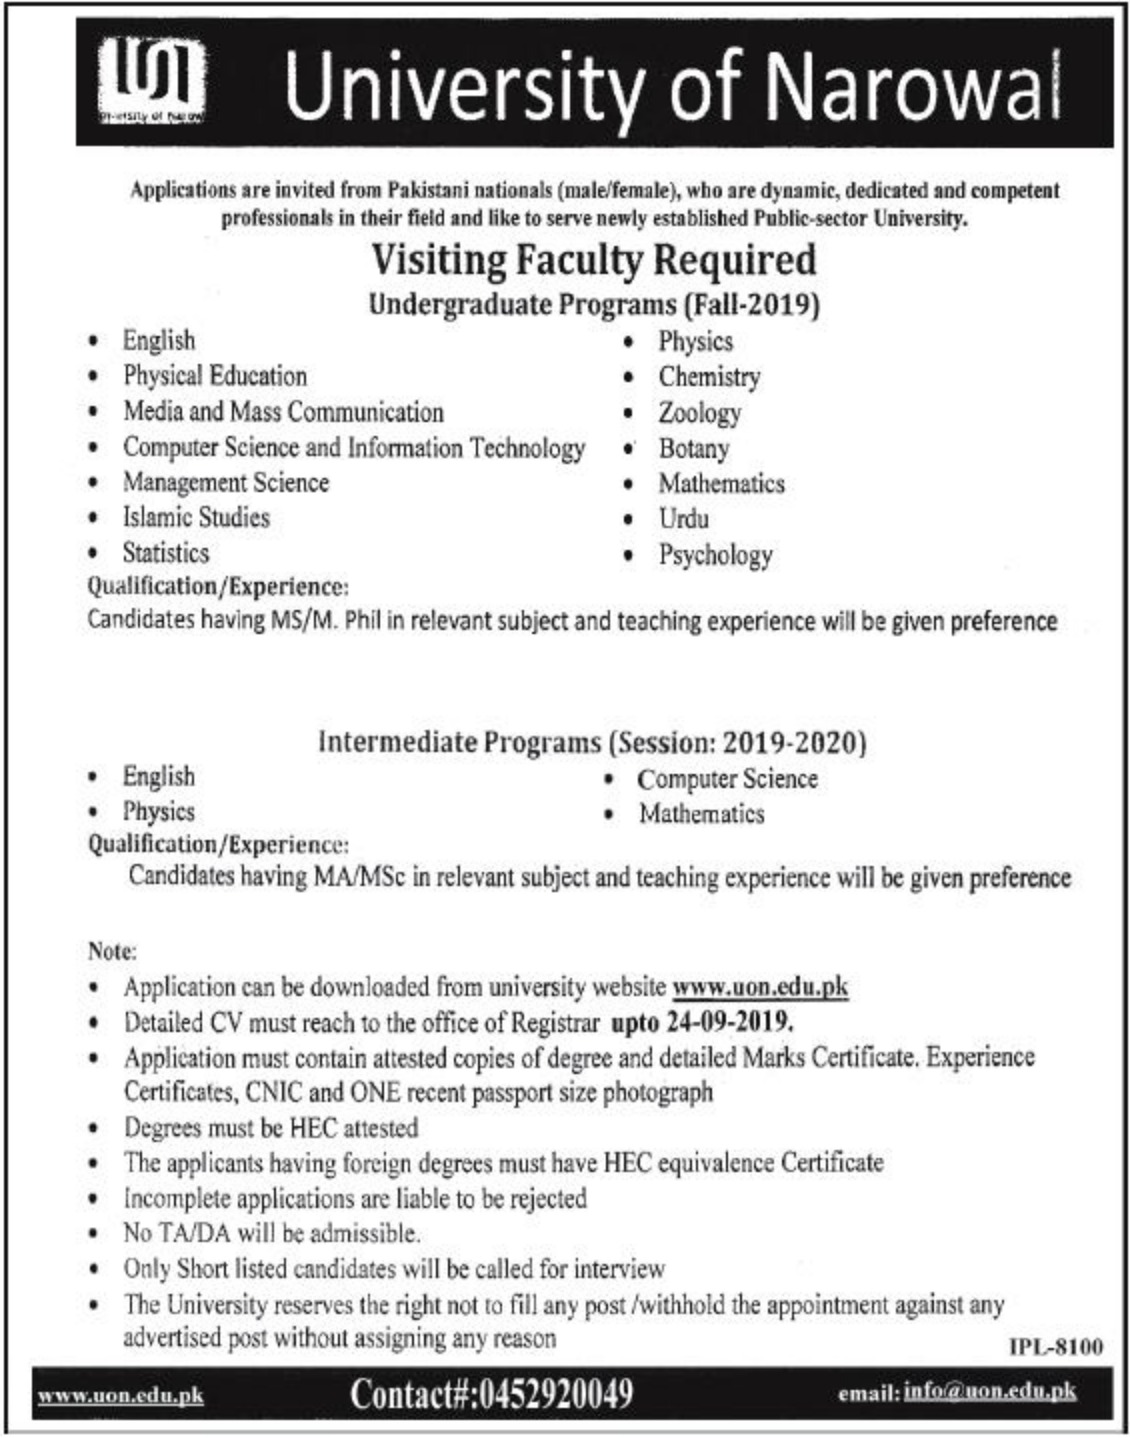 University of Narowal Undergraduate Intermediate Programs Jobs